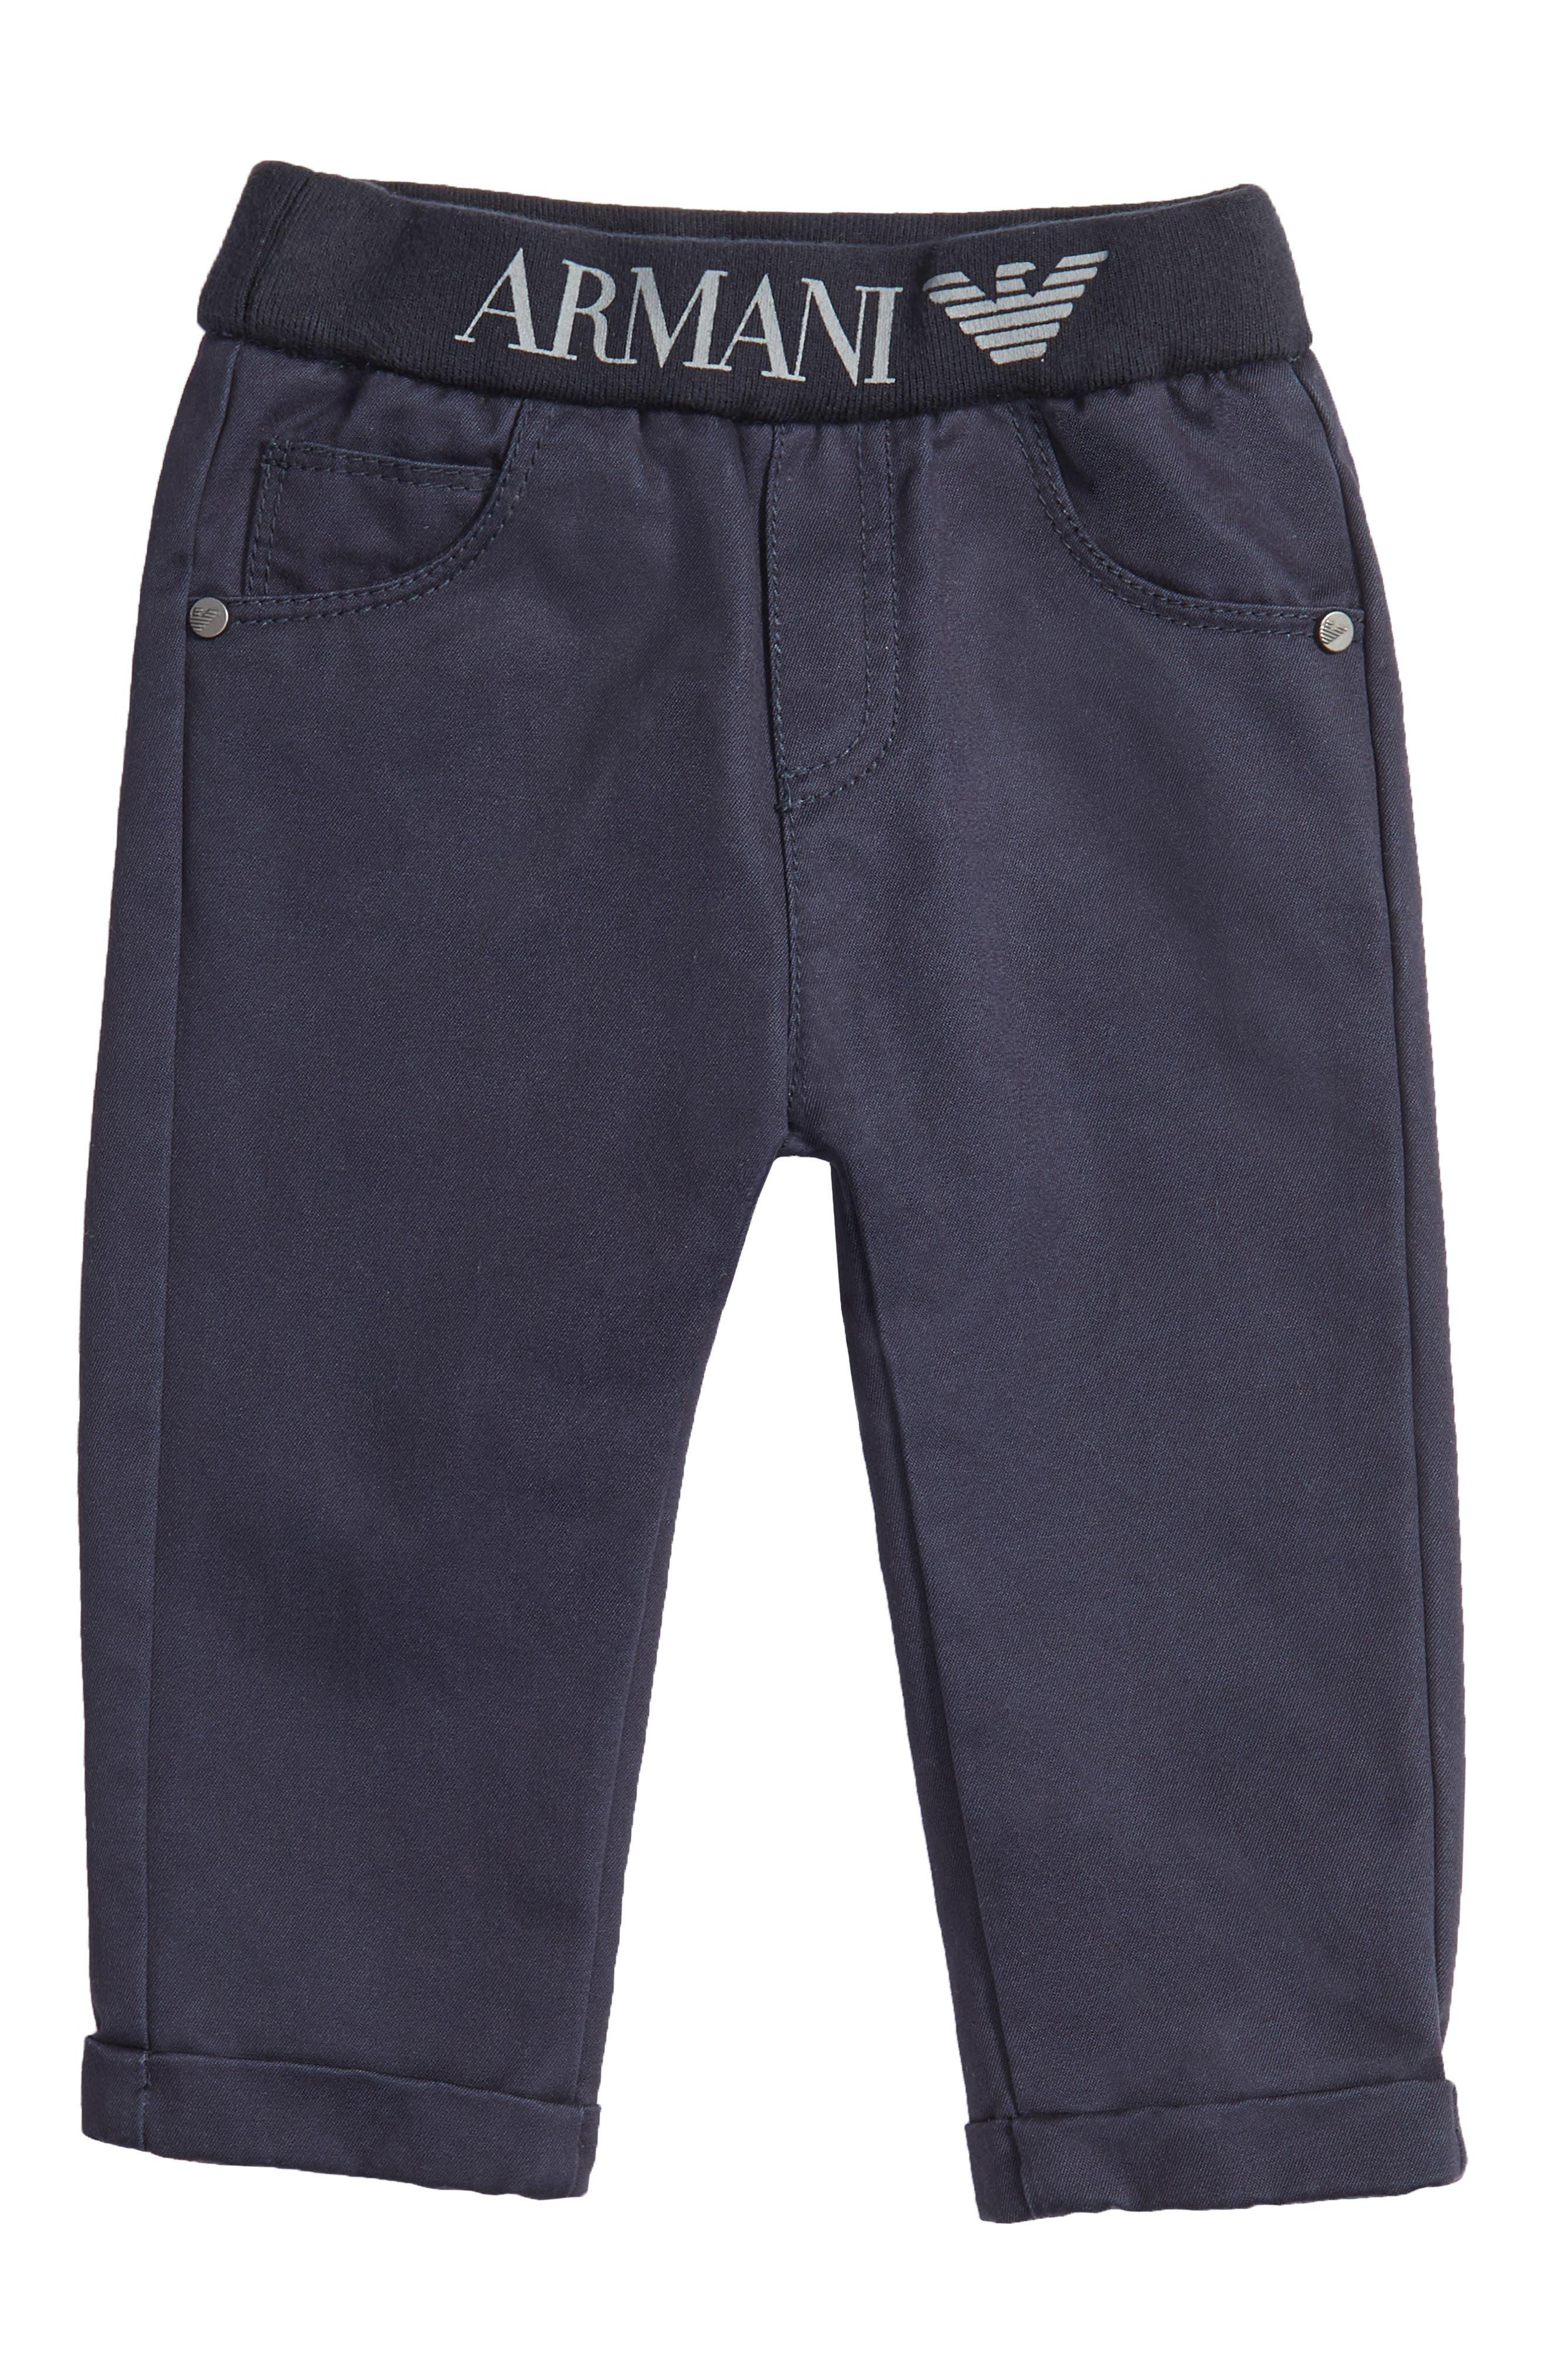 Cotton Twill Pants,                             Main thumbnail 1, color,                             424